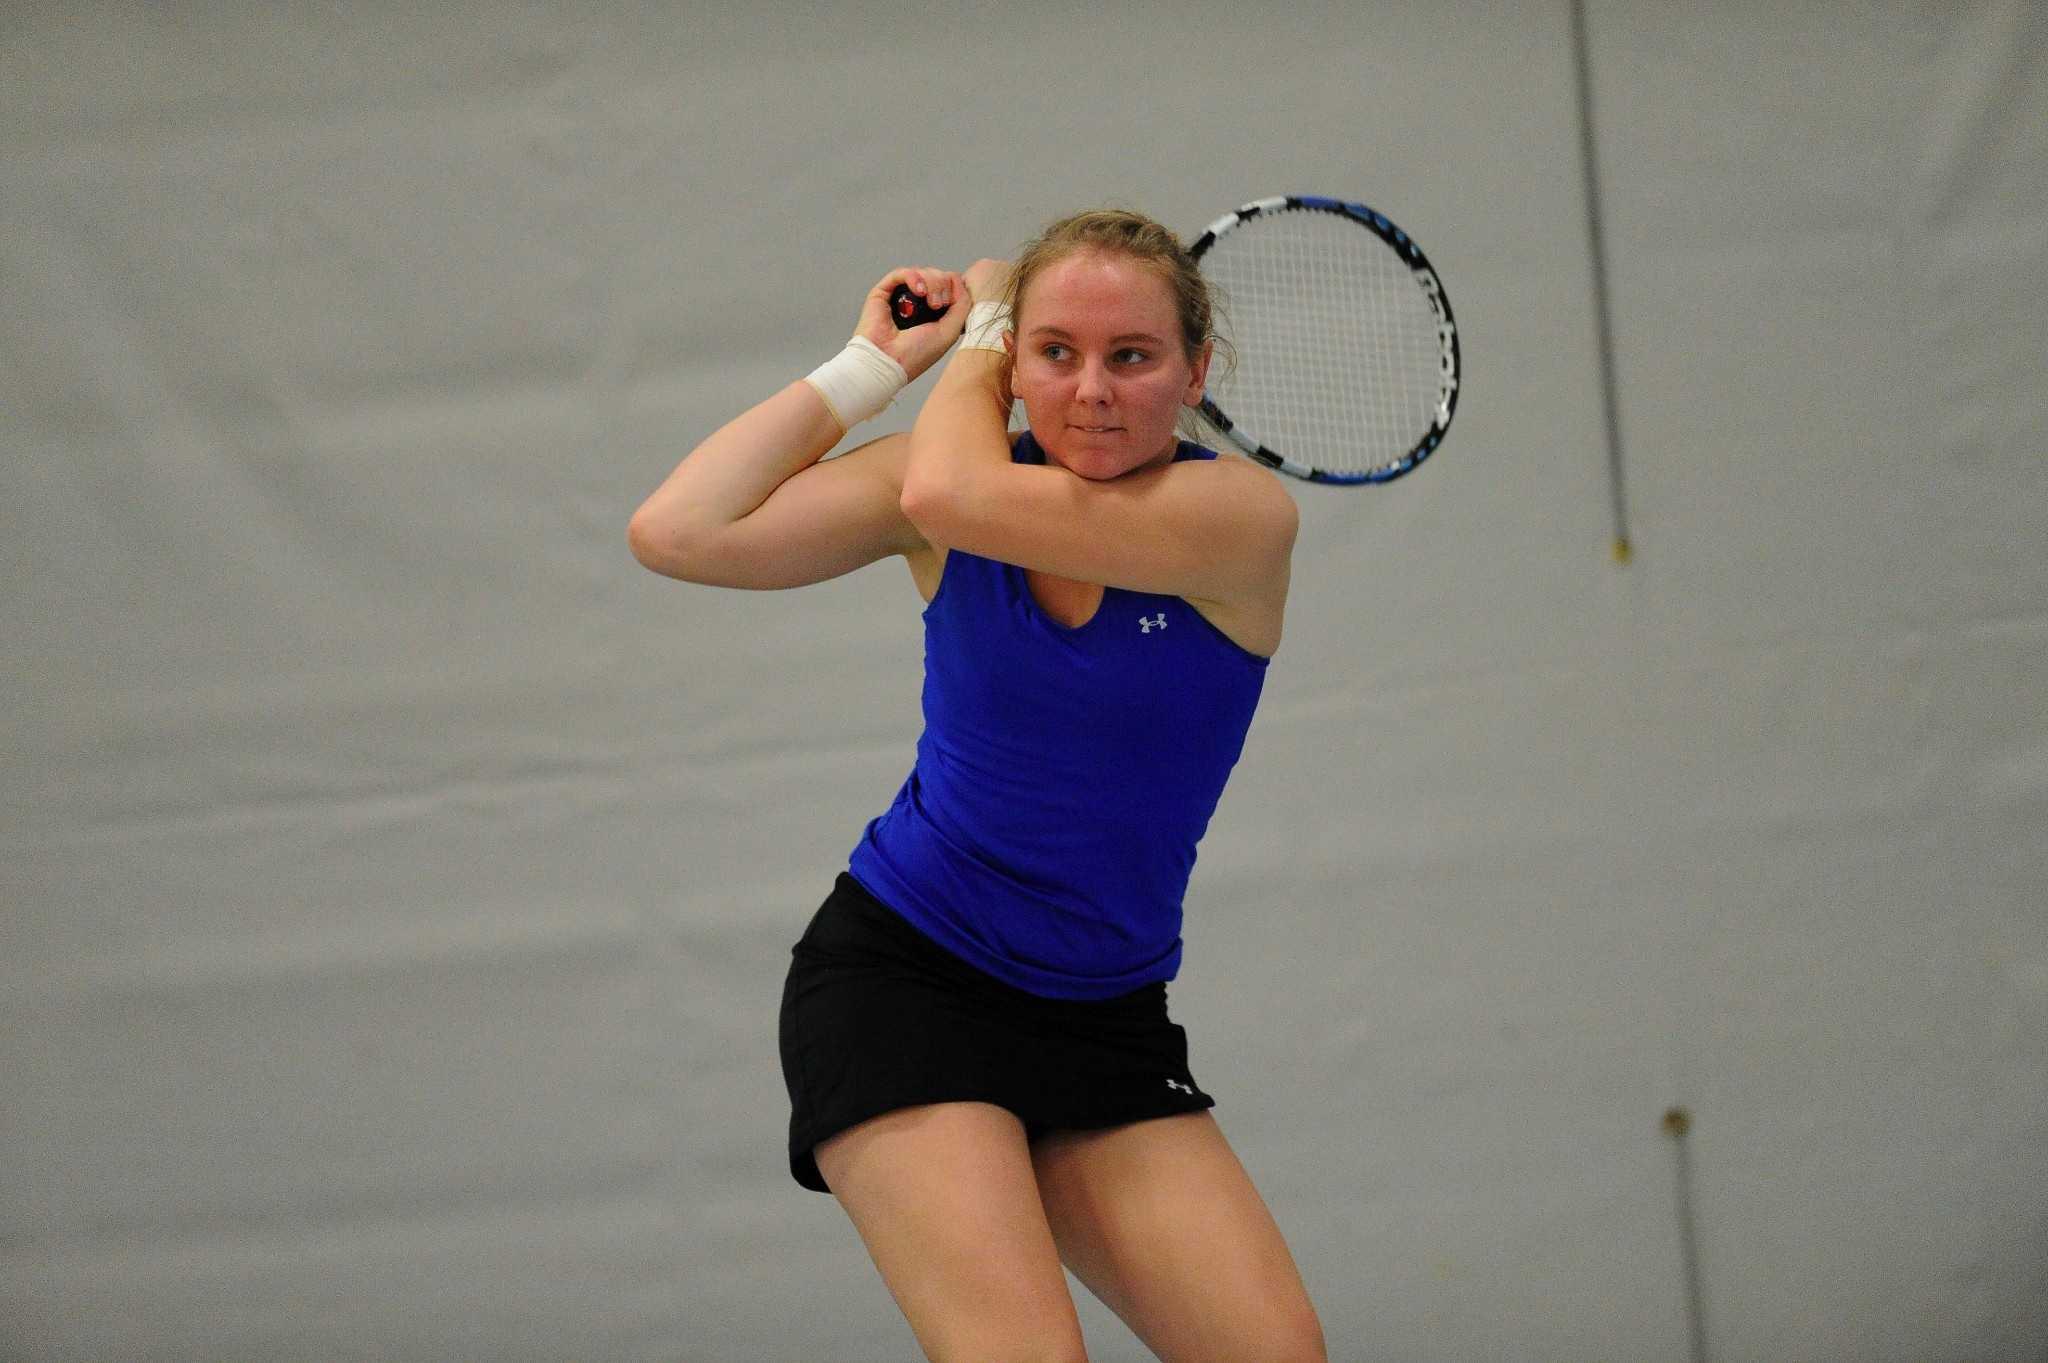 Women's tennis team to start MIAC play on Friday